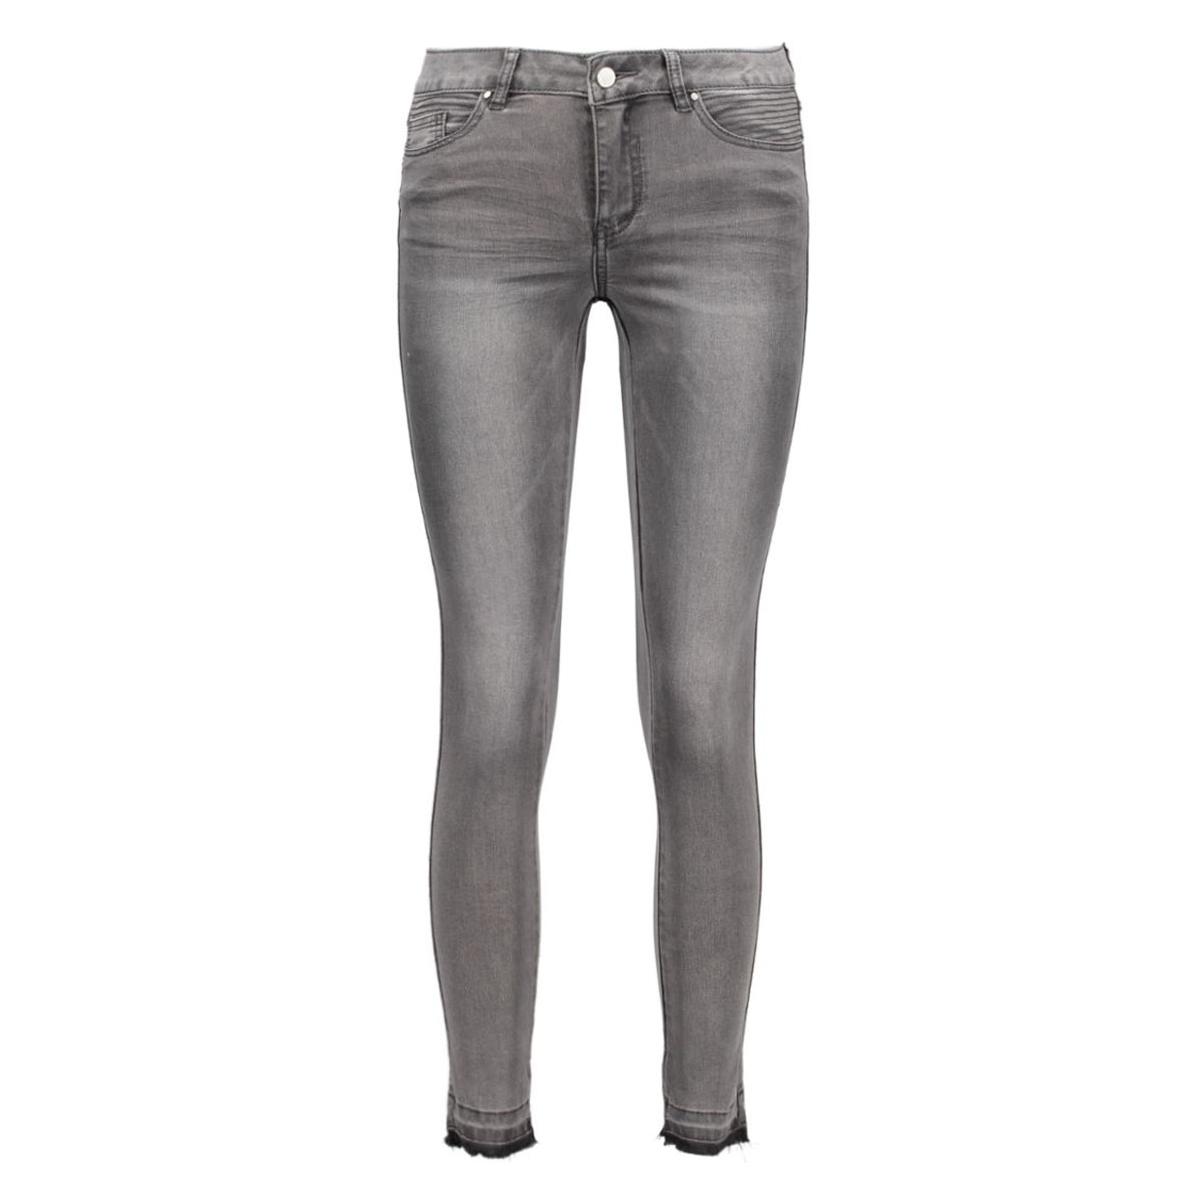 vicommit rw 5p 7/8 hk0015 rawstitch 14035516 vila jeans grey denim